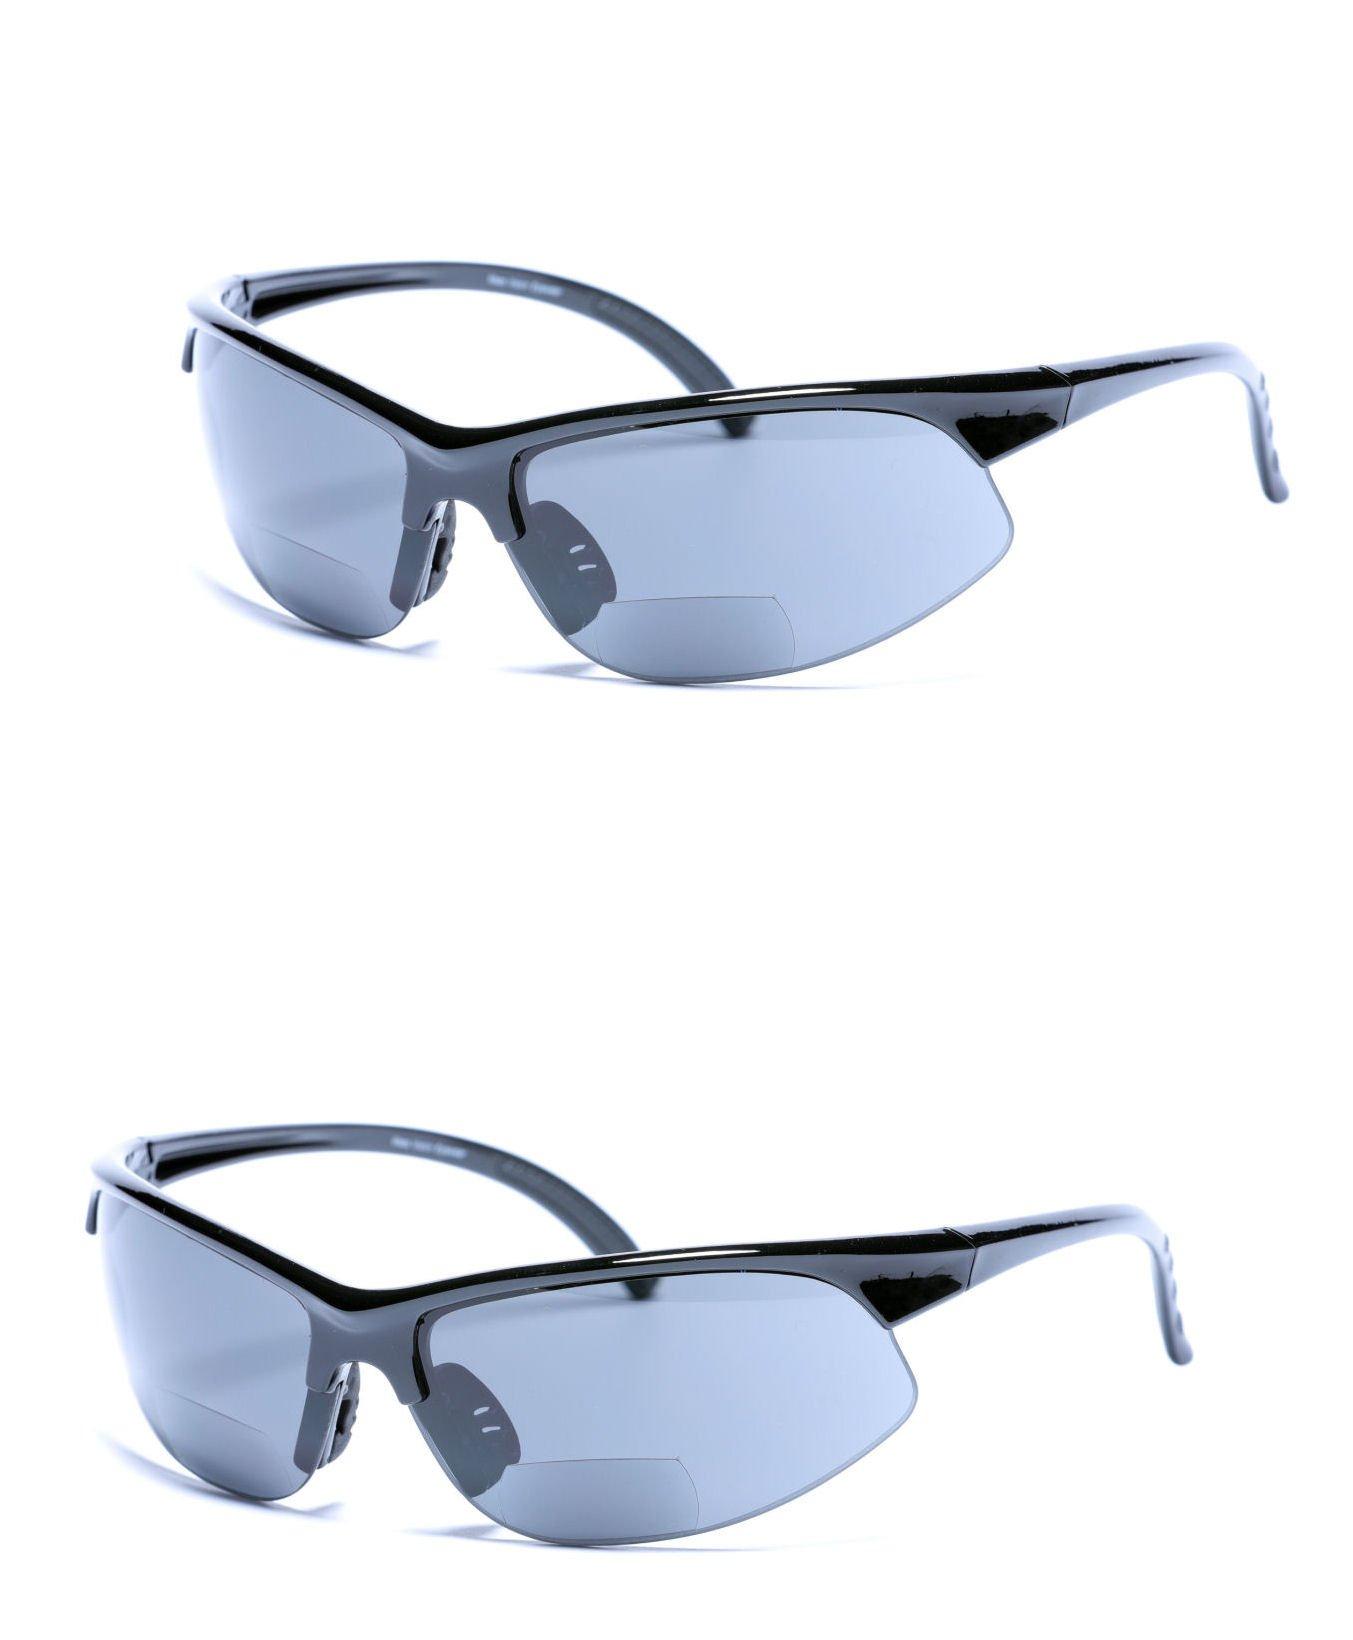 fdb8359f556c Bifocal Sunglass Readers Amazon